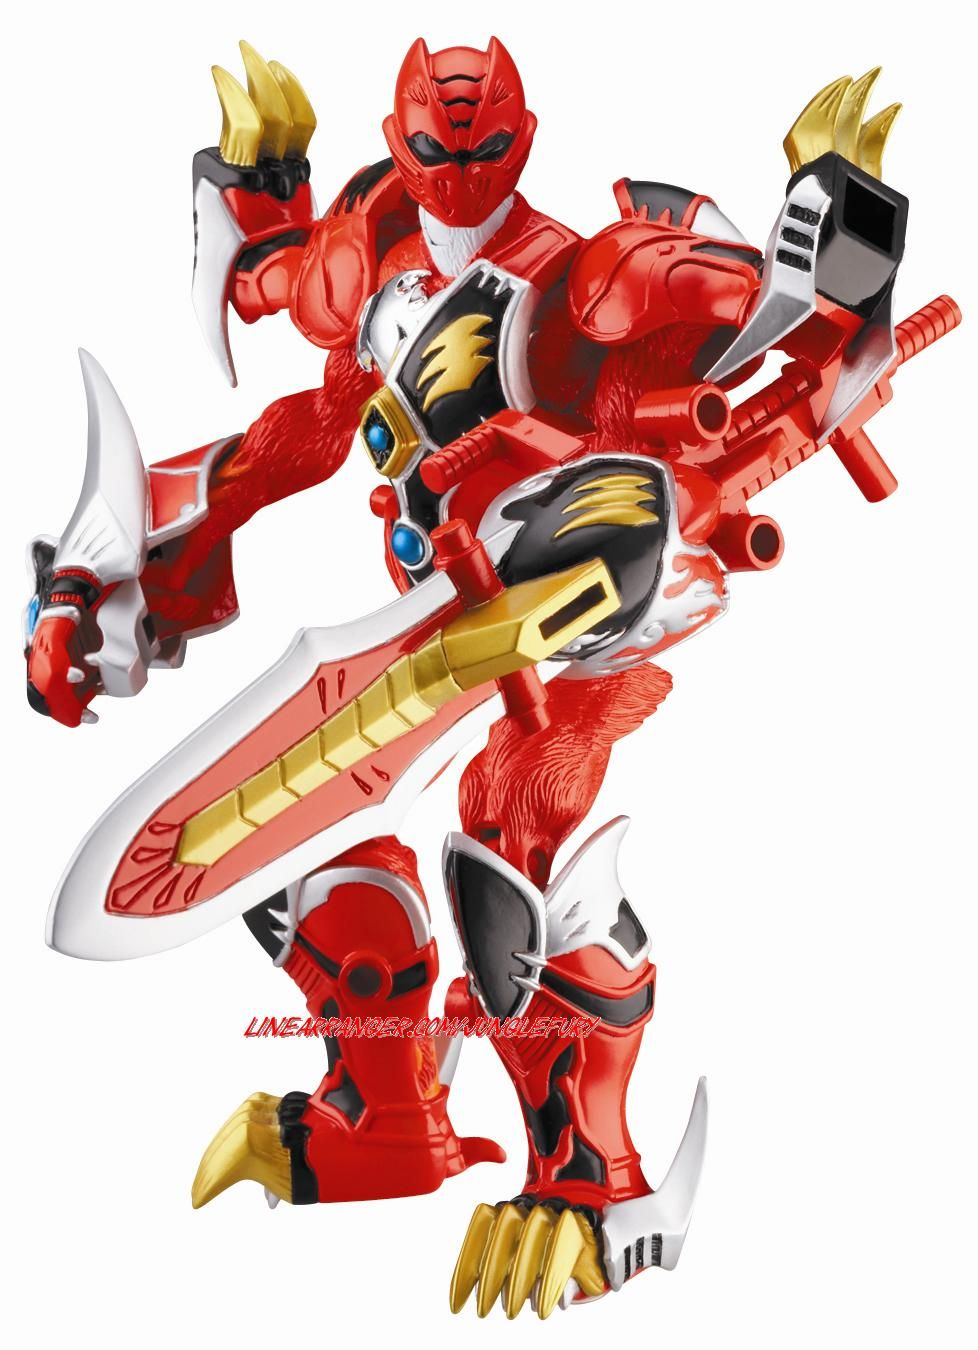 Power Rangers Jungle Fury Red Ranger Battlizer Power Rangers